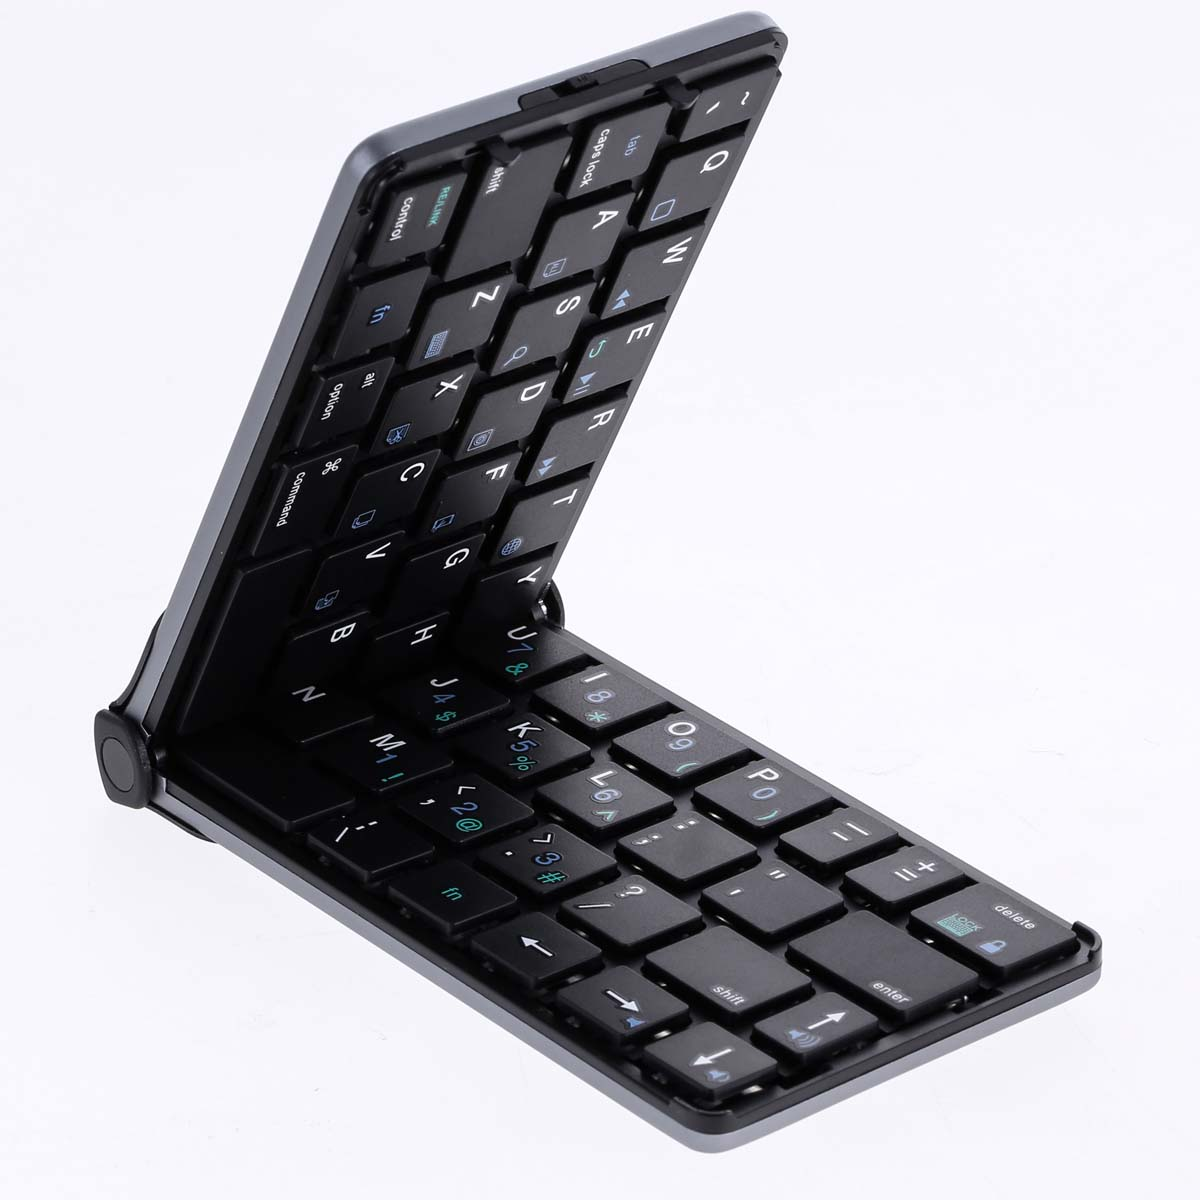 Foldable Keyboard Bluetooth Keyboard 4 2 Keypad for Android IOS Windows font b Tablet b font